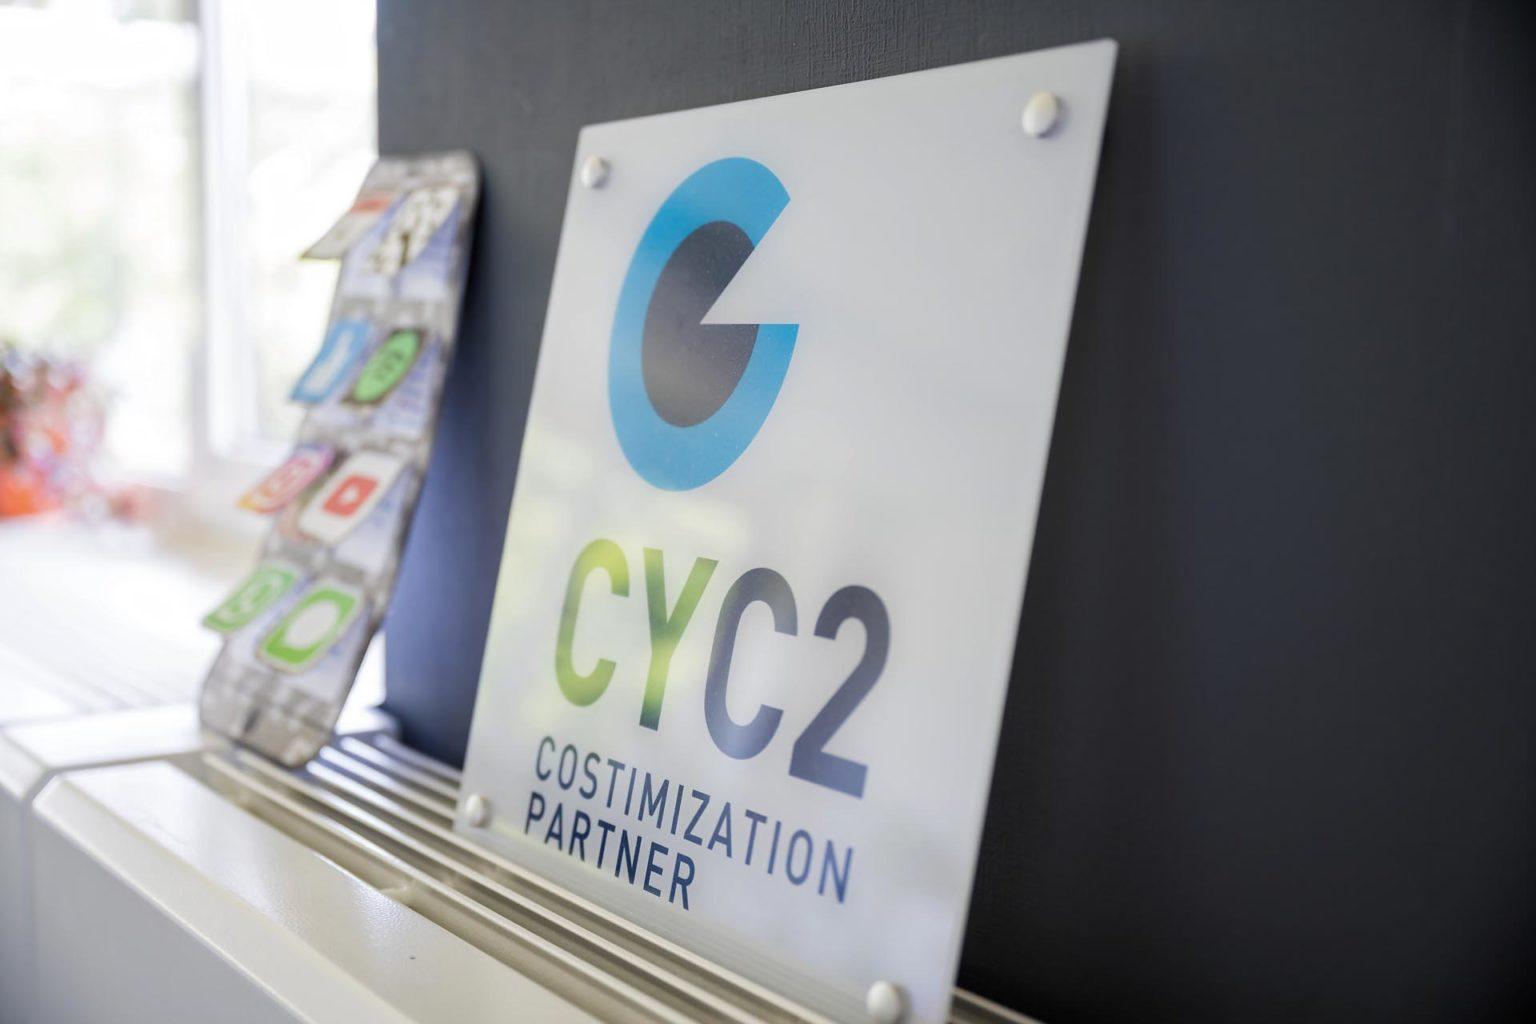 CYC2 Costimization Partner